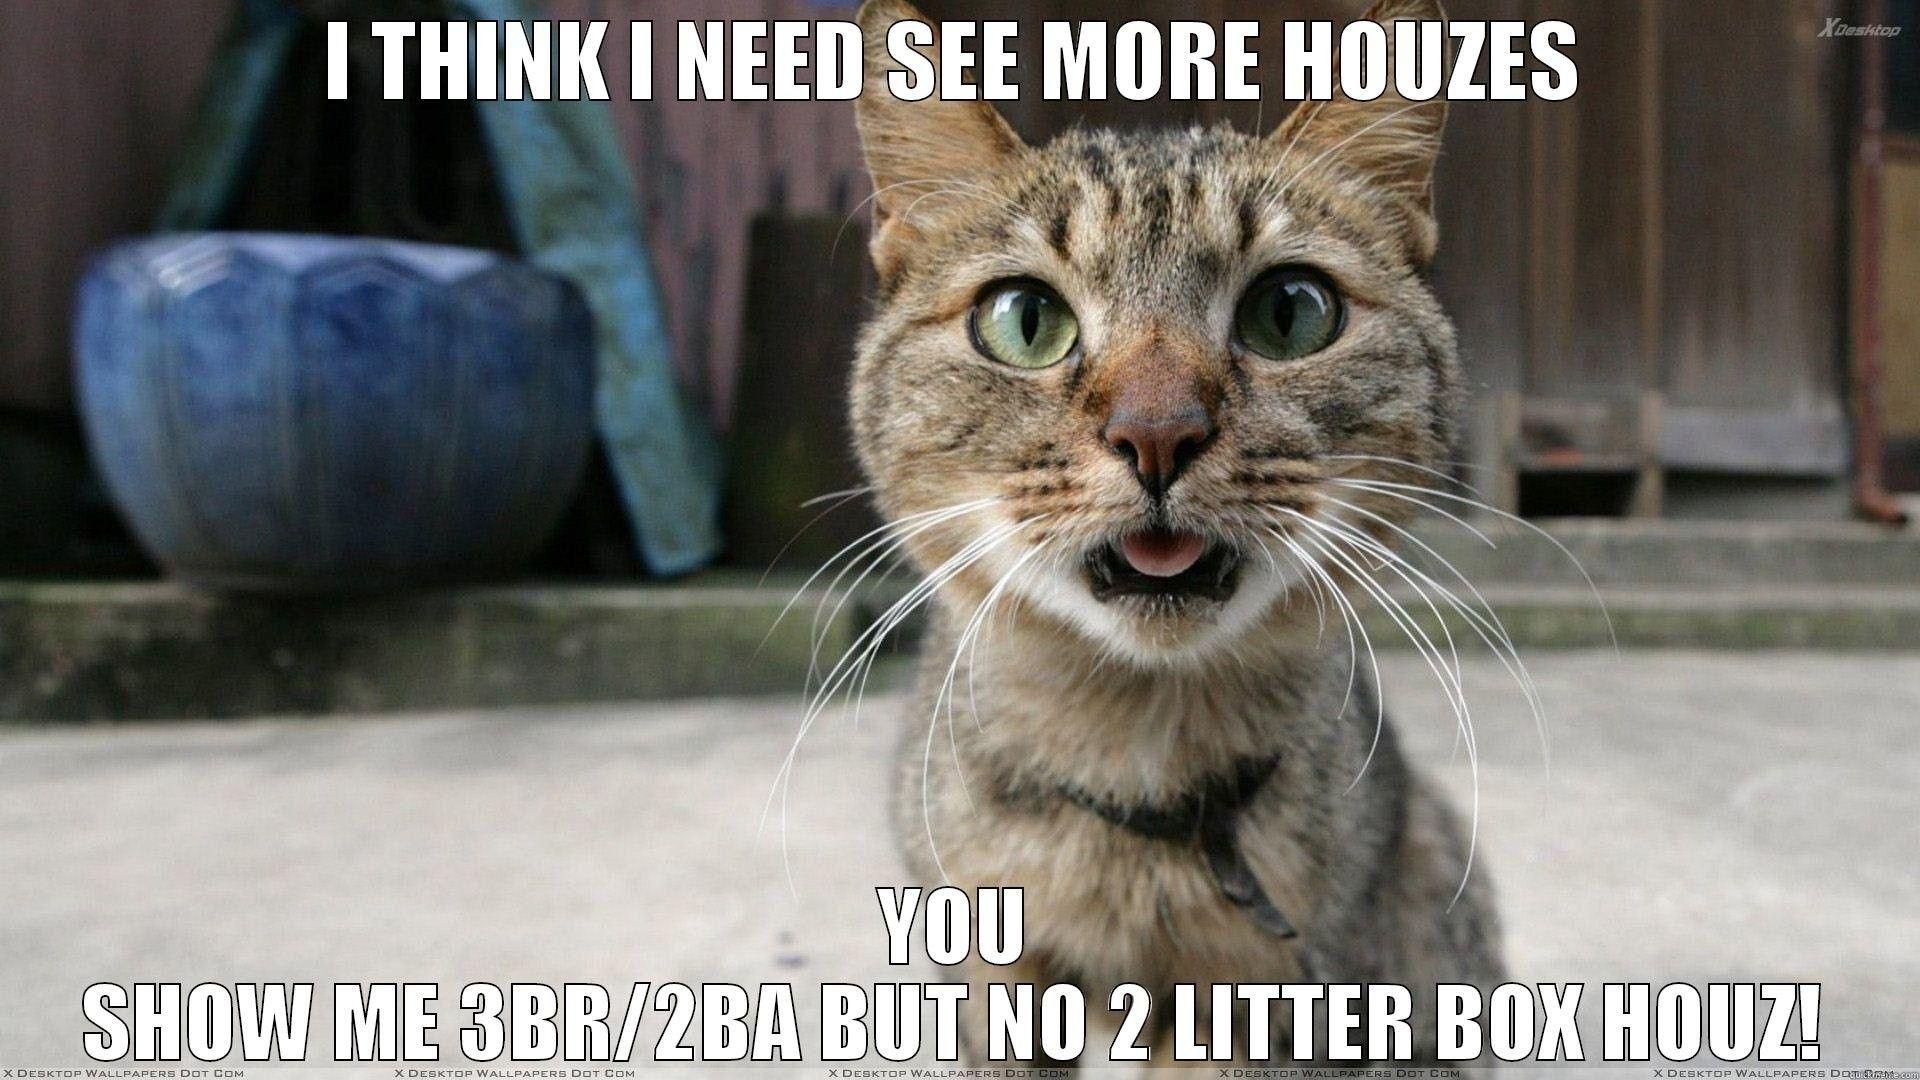 Cat Meme Wallpapers   Top Cat Meme Backgrounds   WallpaperAccess 1920x1080